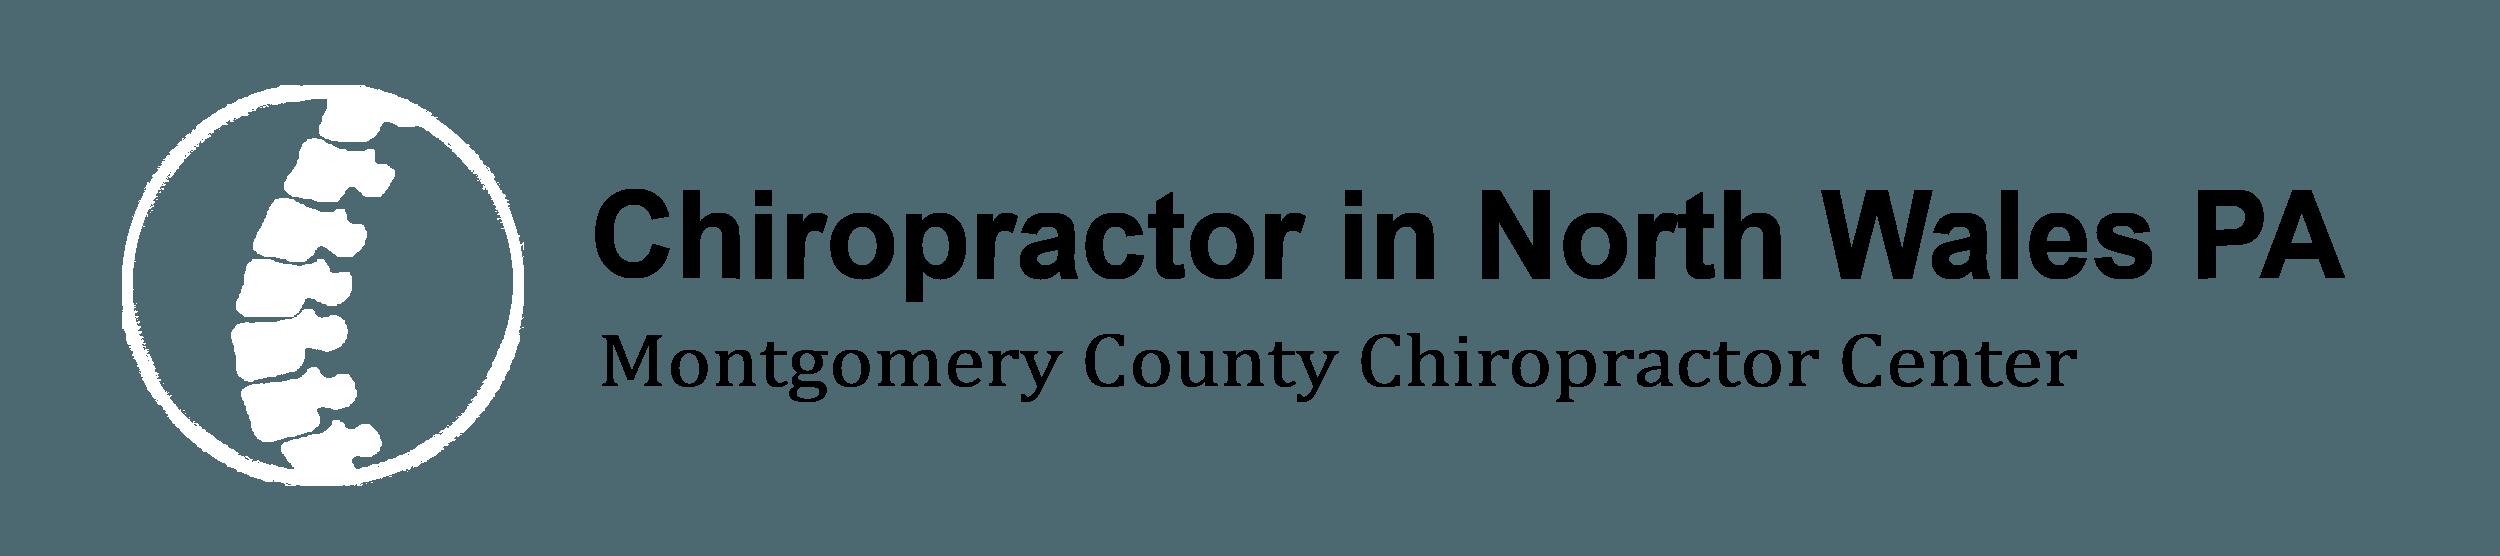 Montgomery County Chiropractor Center